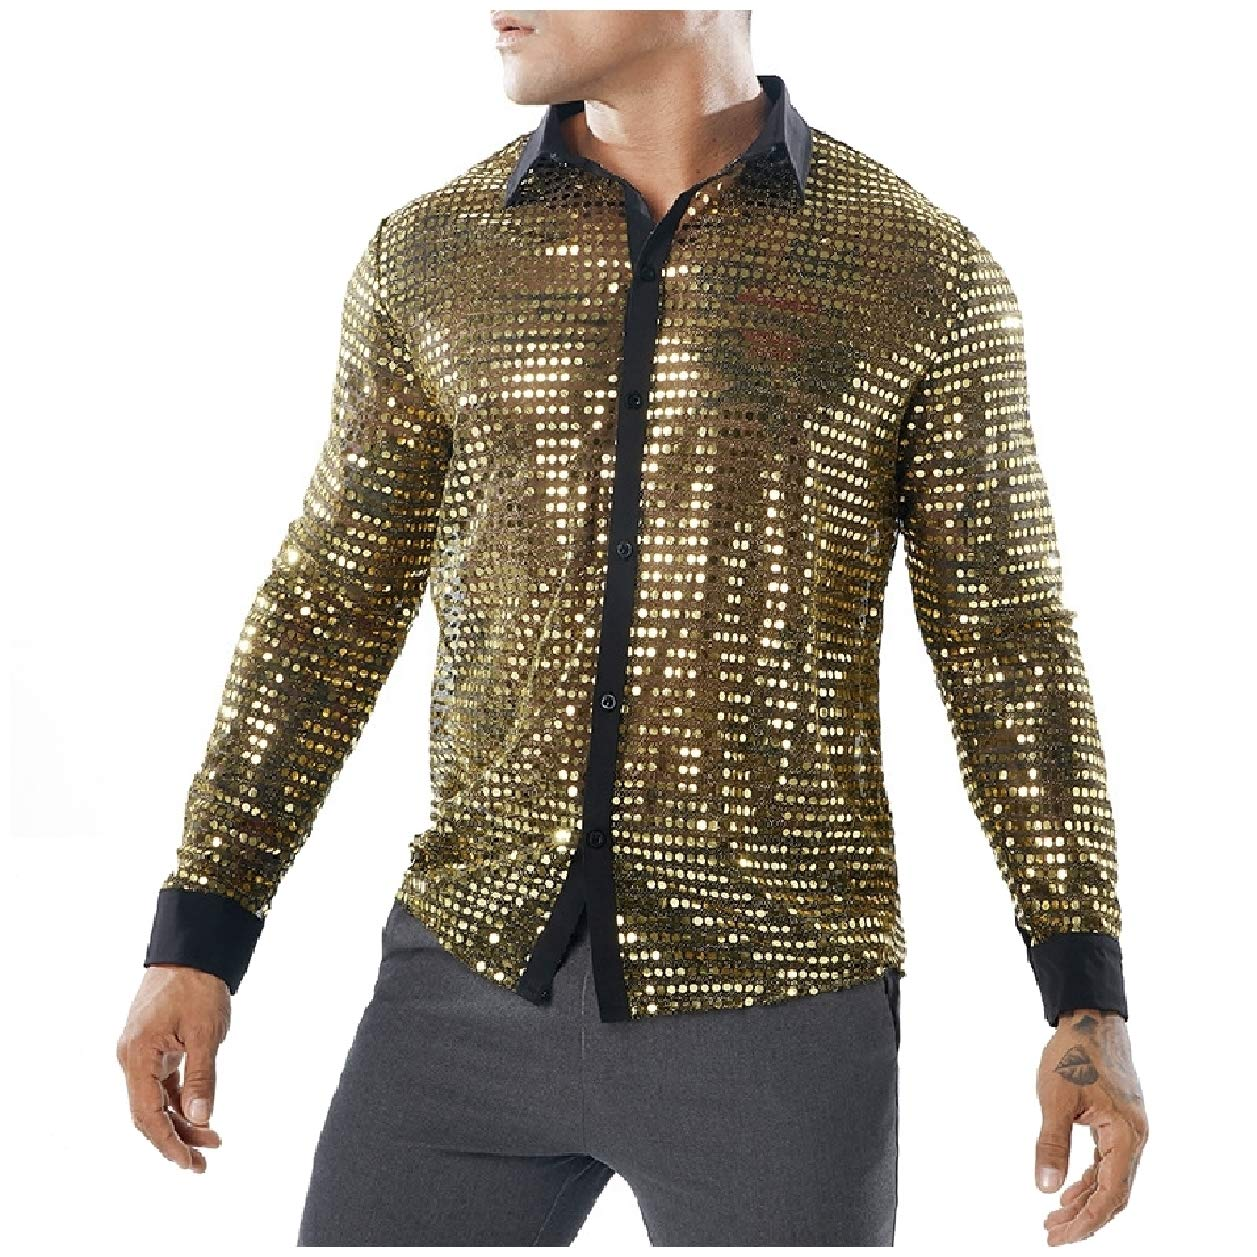 Tootless-Men See-Through Long Sleeve Nightclub Style Sequin Dress Shirt